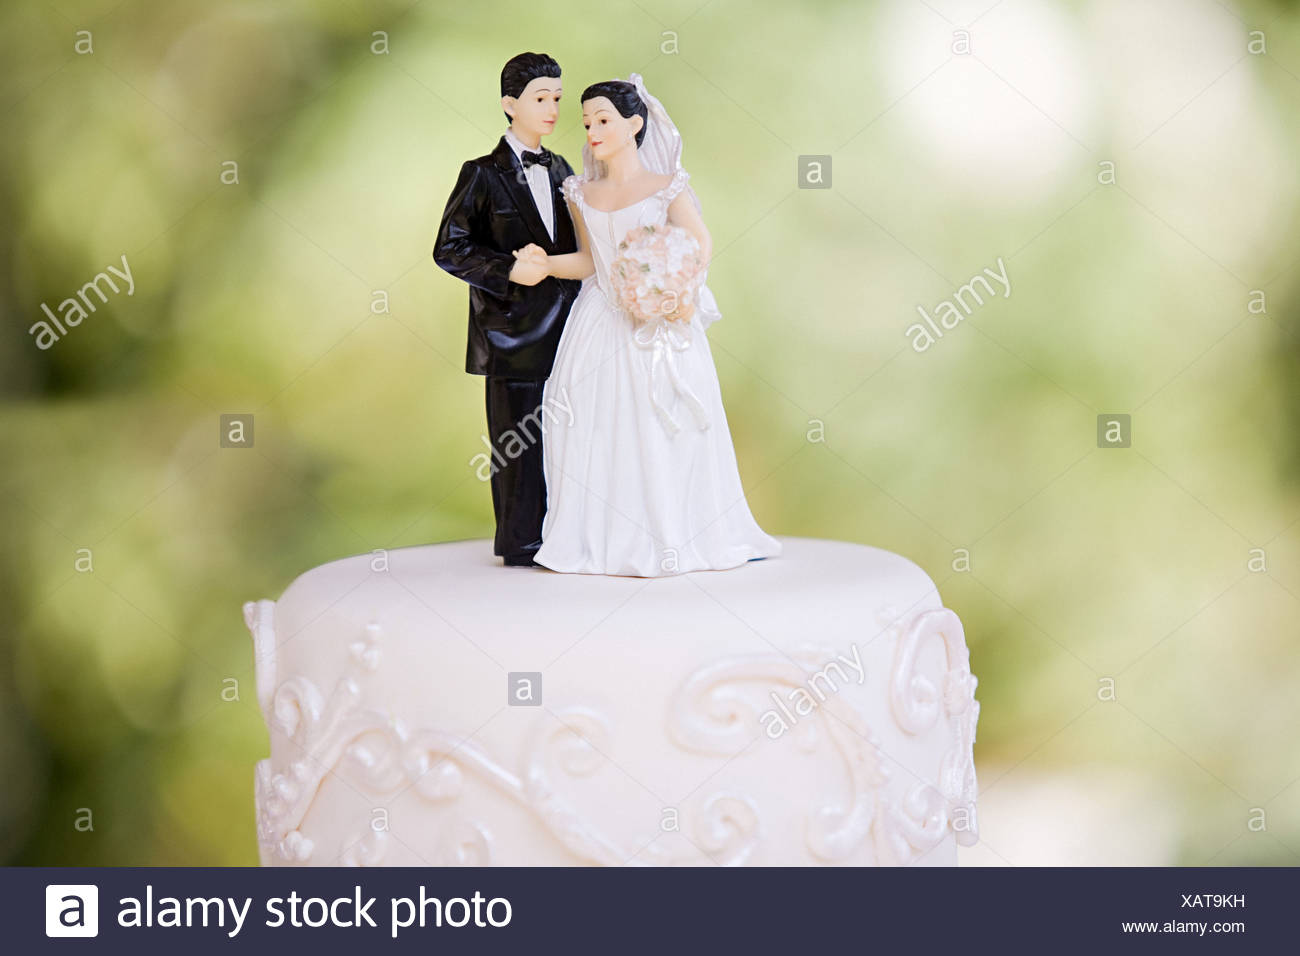 Bride and groom figurines Stock Photo: 282046901 - Alamy